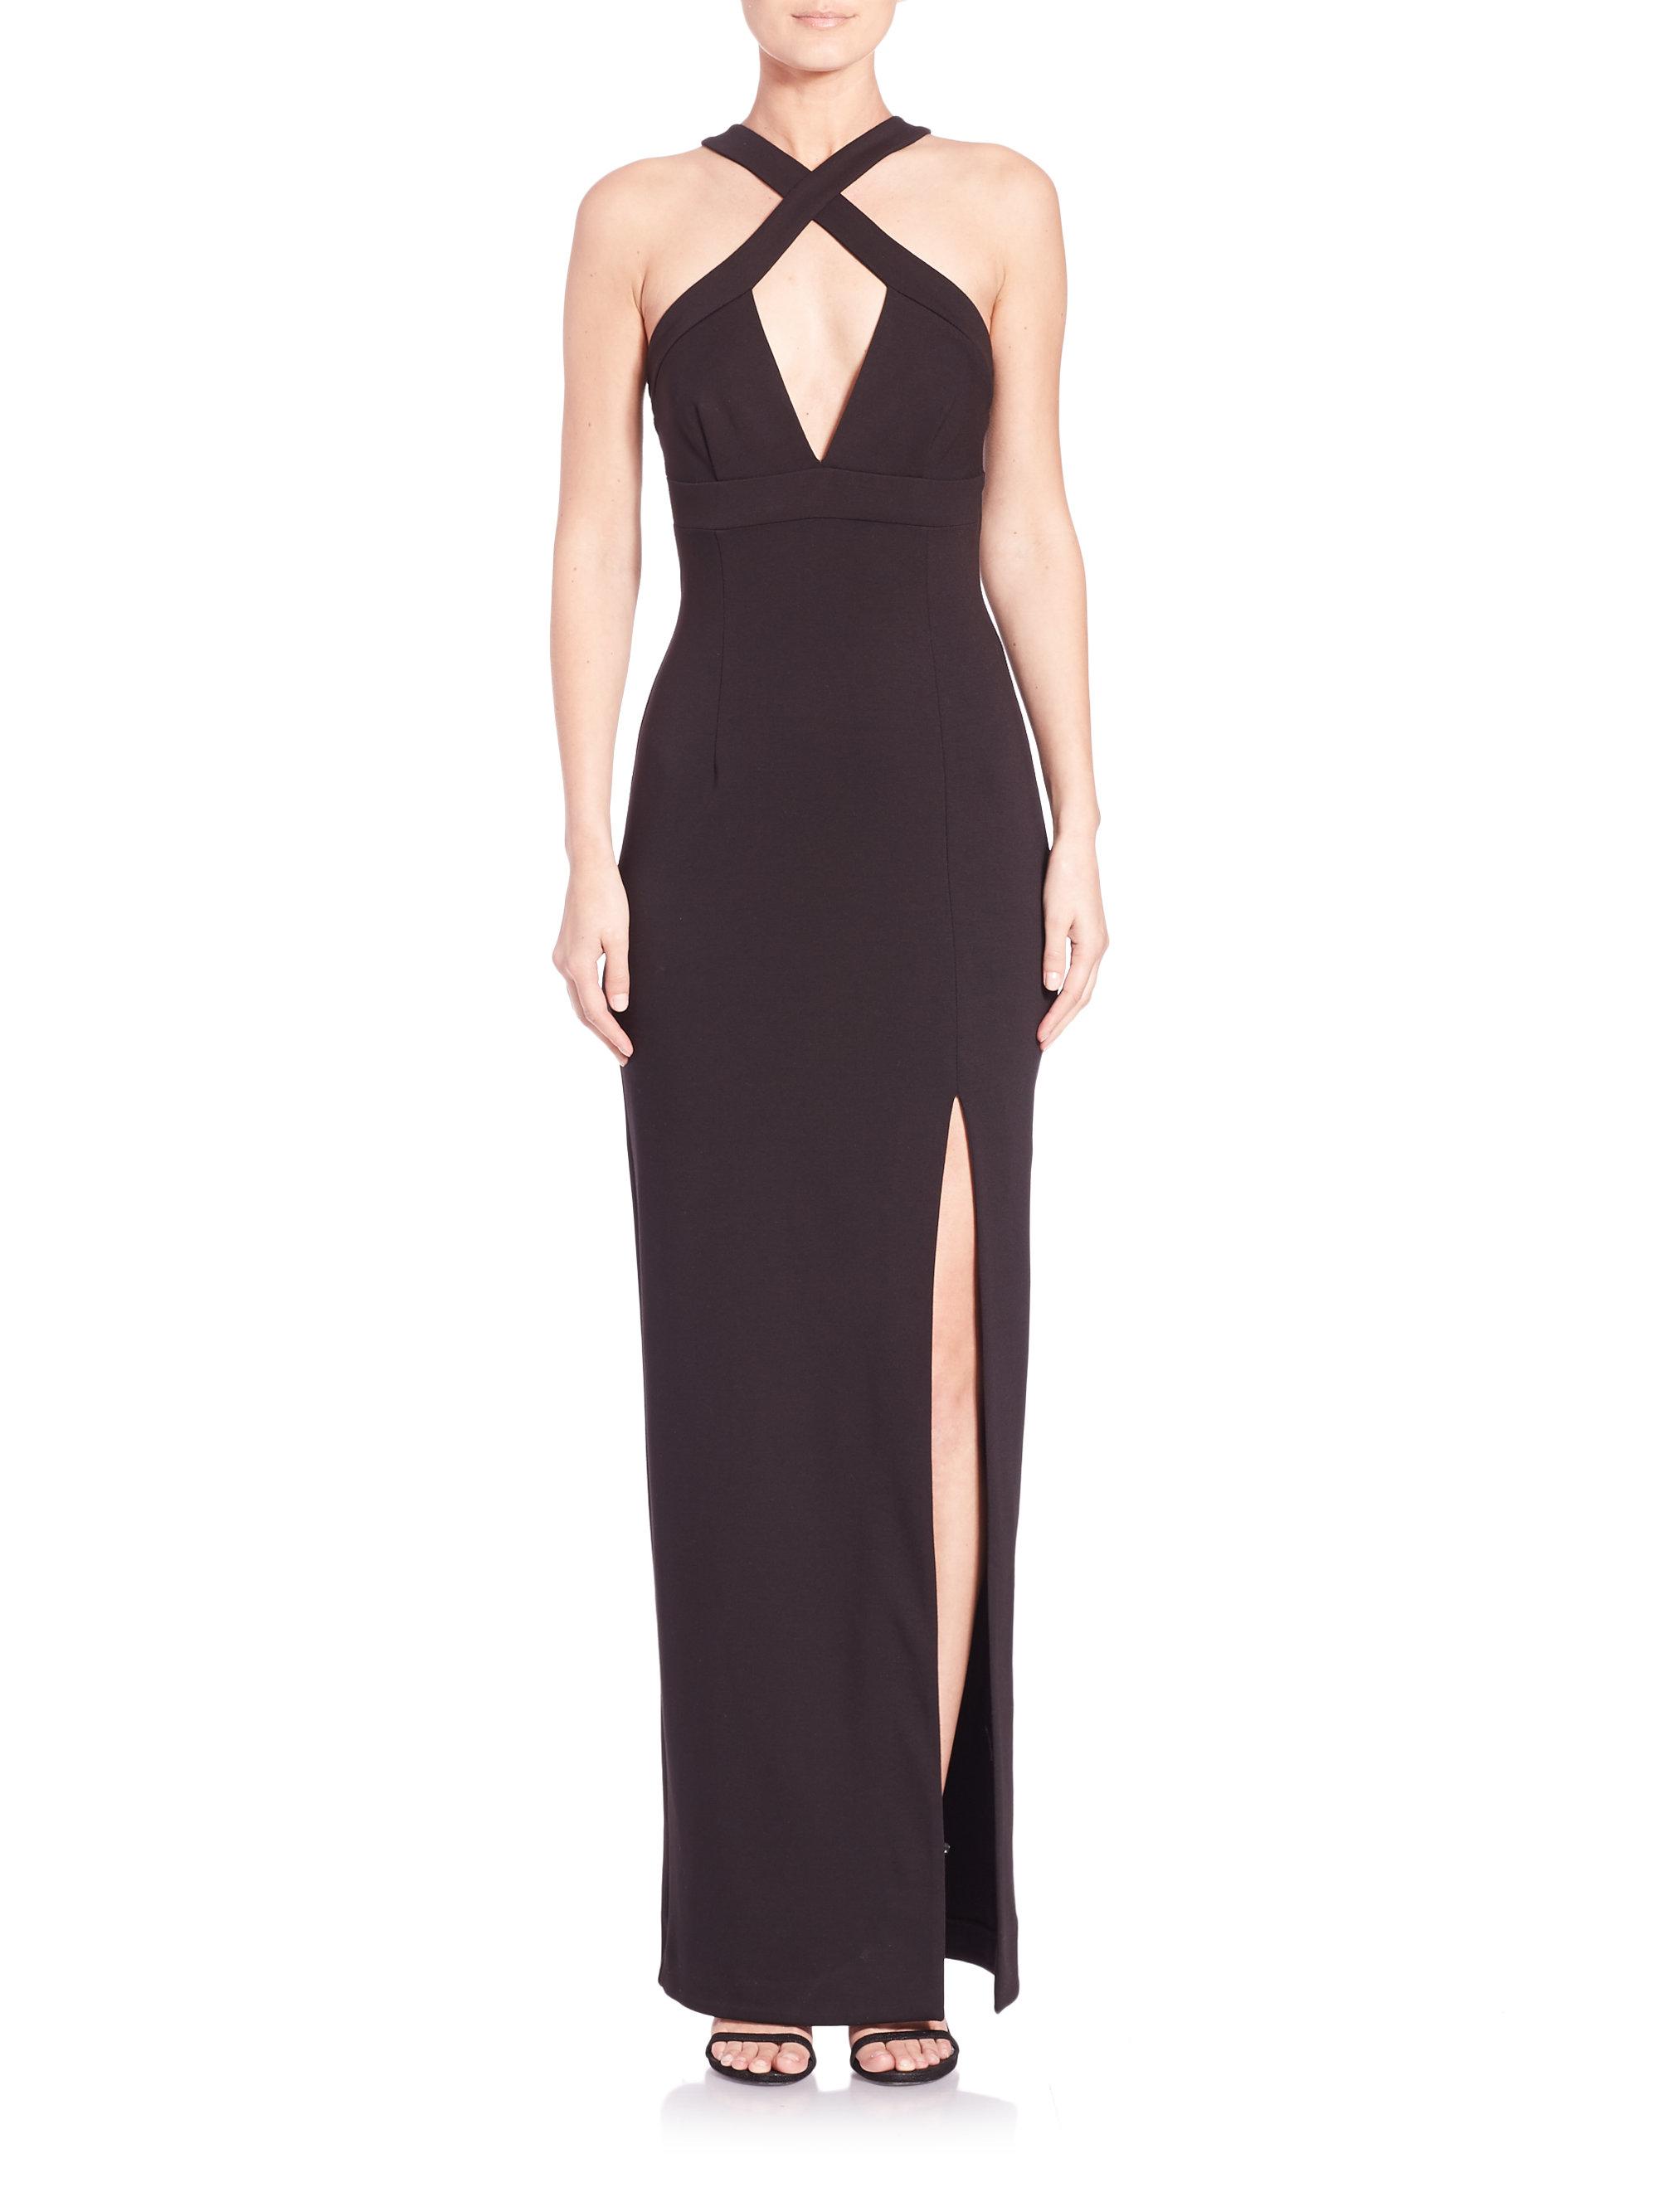 Black diamond cut out dress